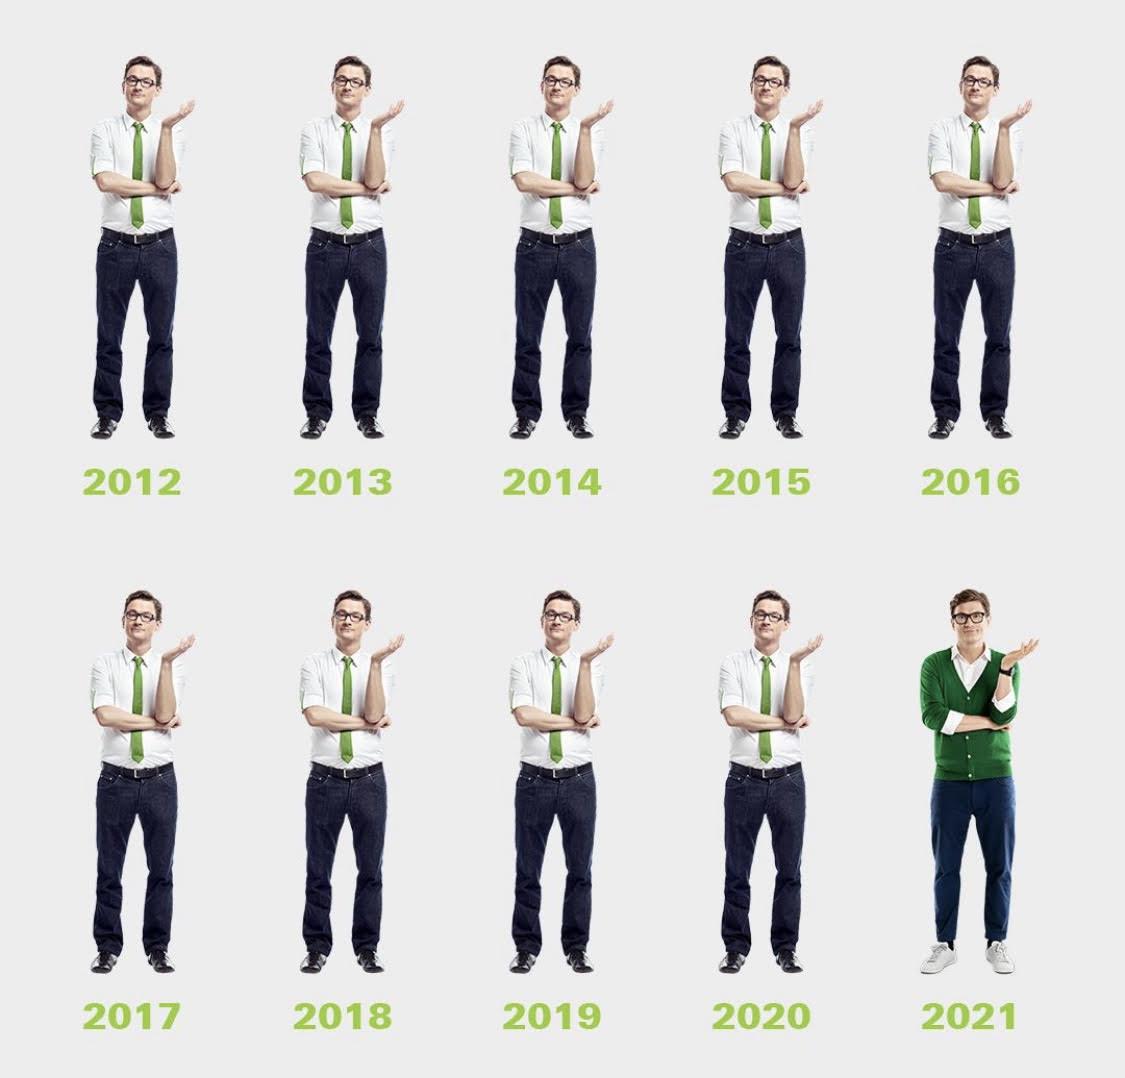 Vývoj šatníku Air Bank bankéře, zdroj: LinkedIn Air Bank